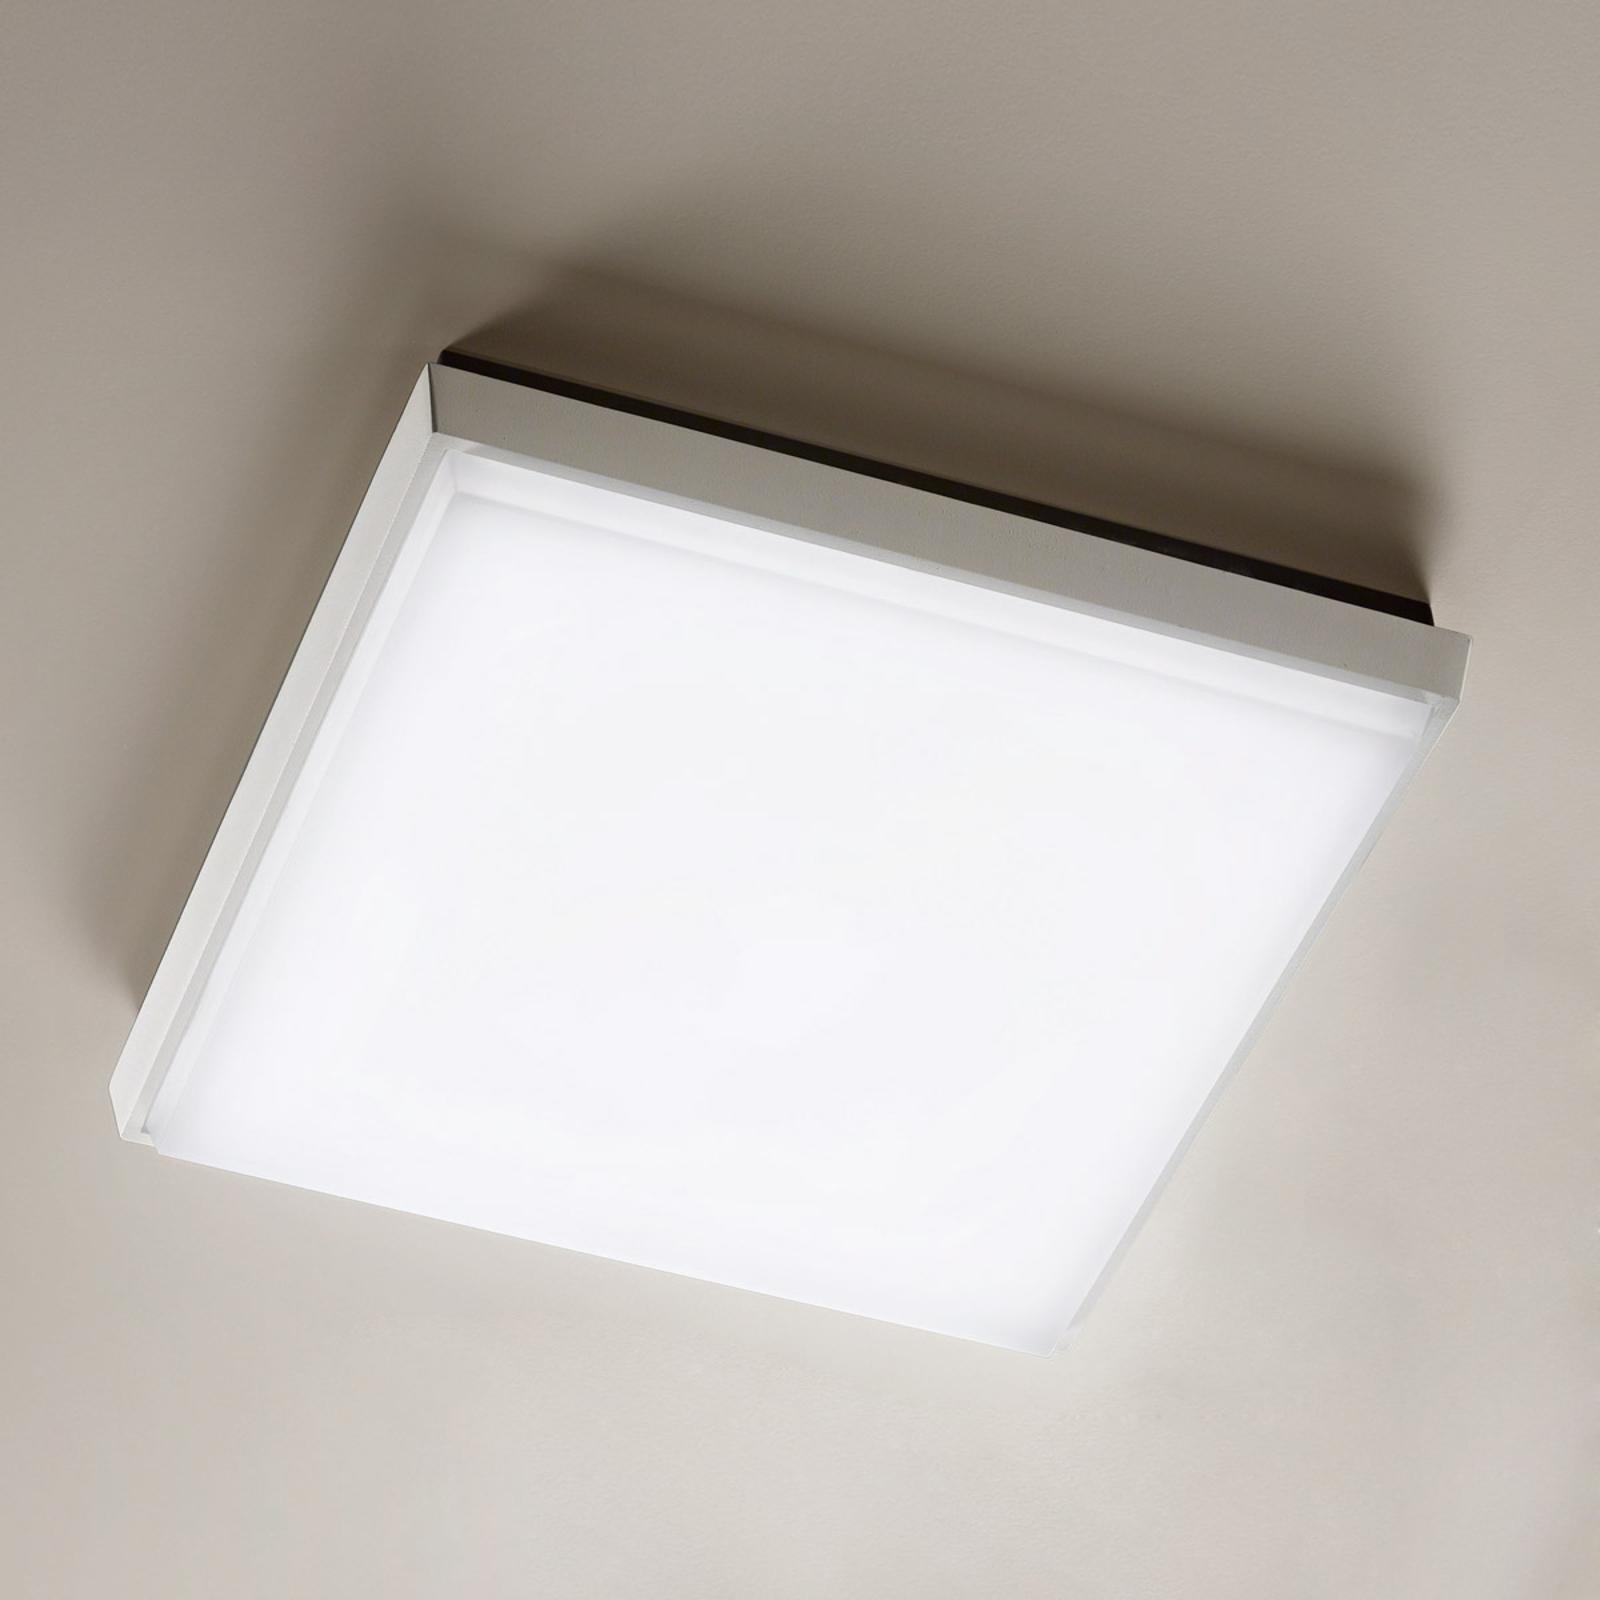 Kulmikas Desdy-LED-ulkokattovalaisin